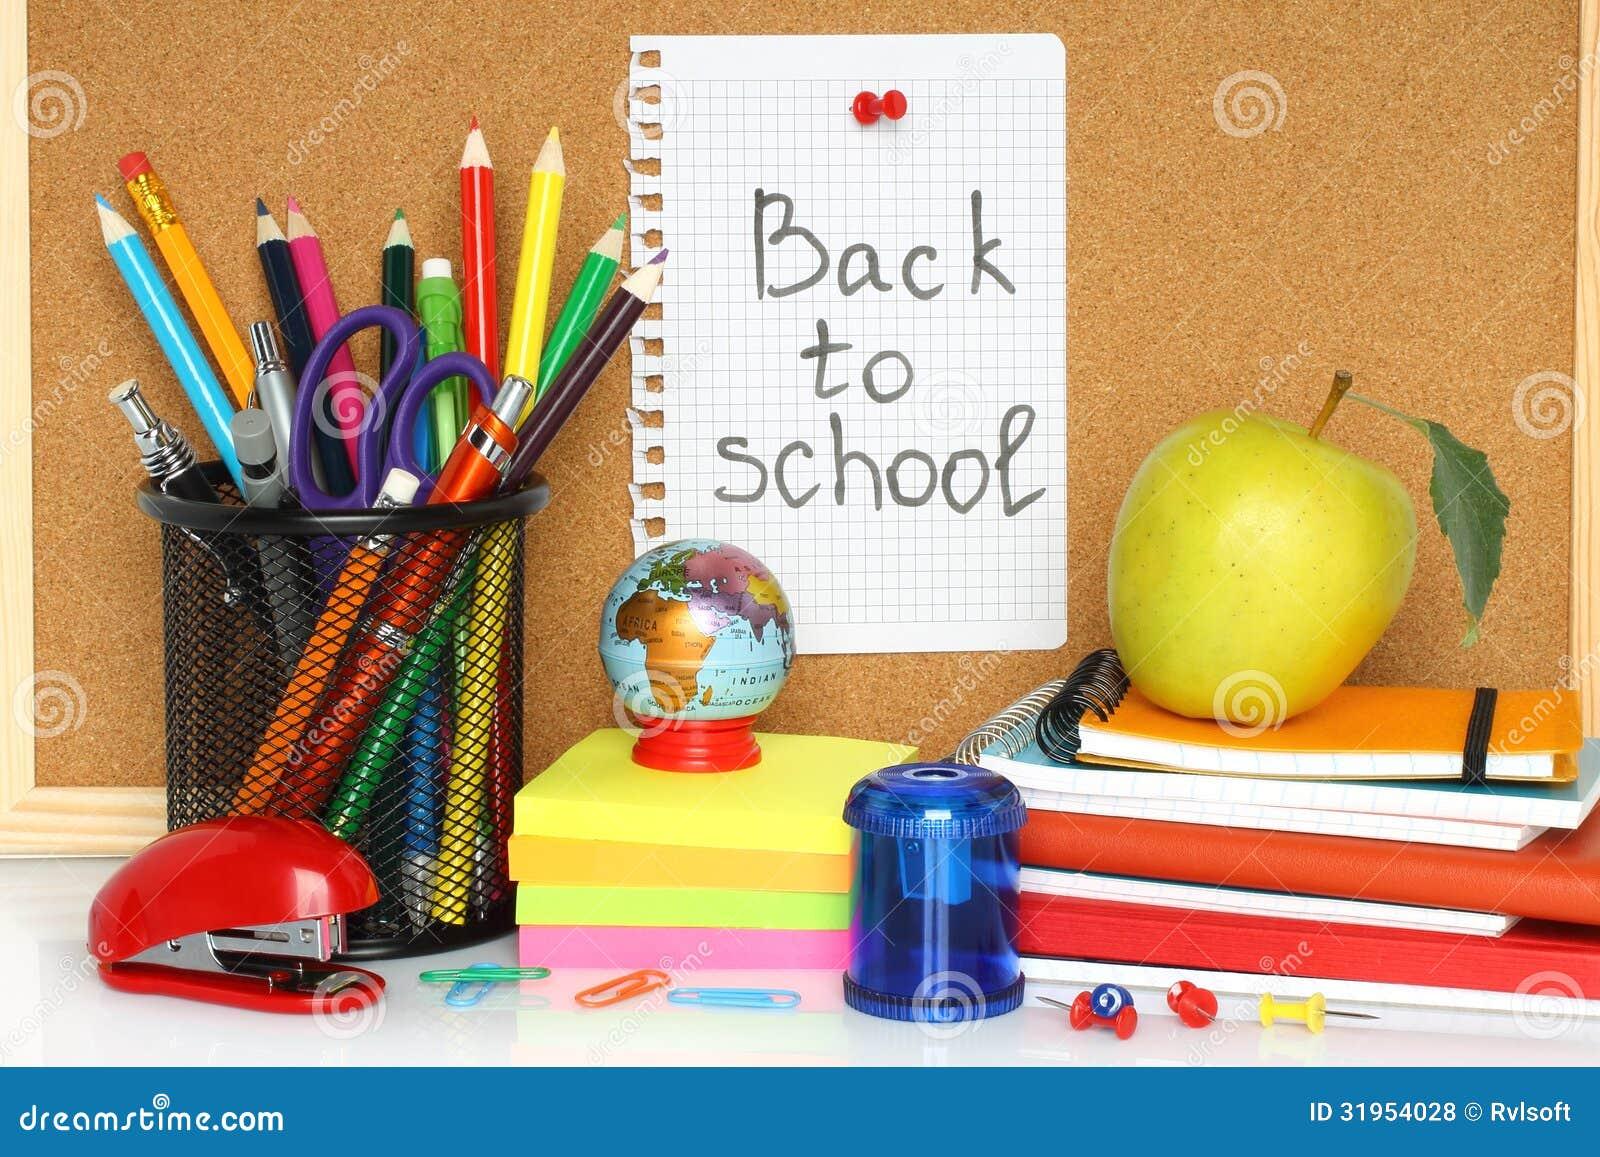 School Stationery Royalty Free Stock Photos - Image: 31954028